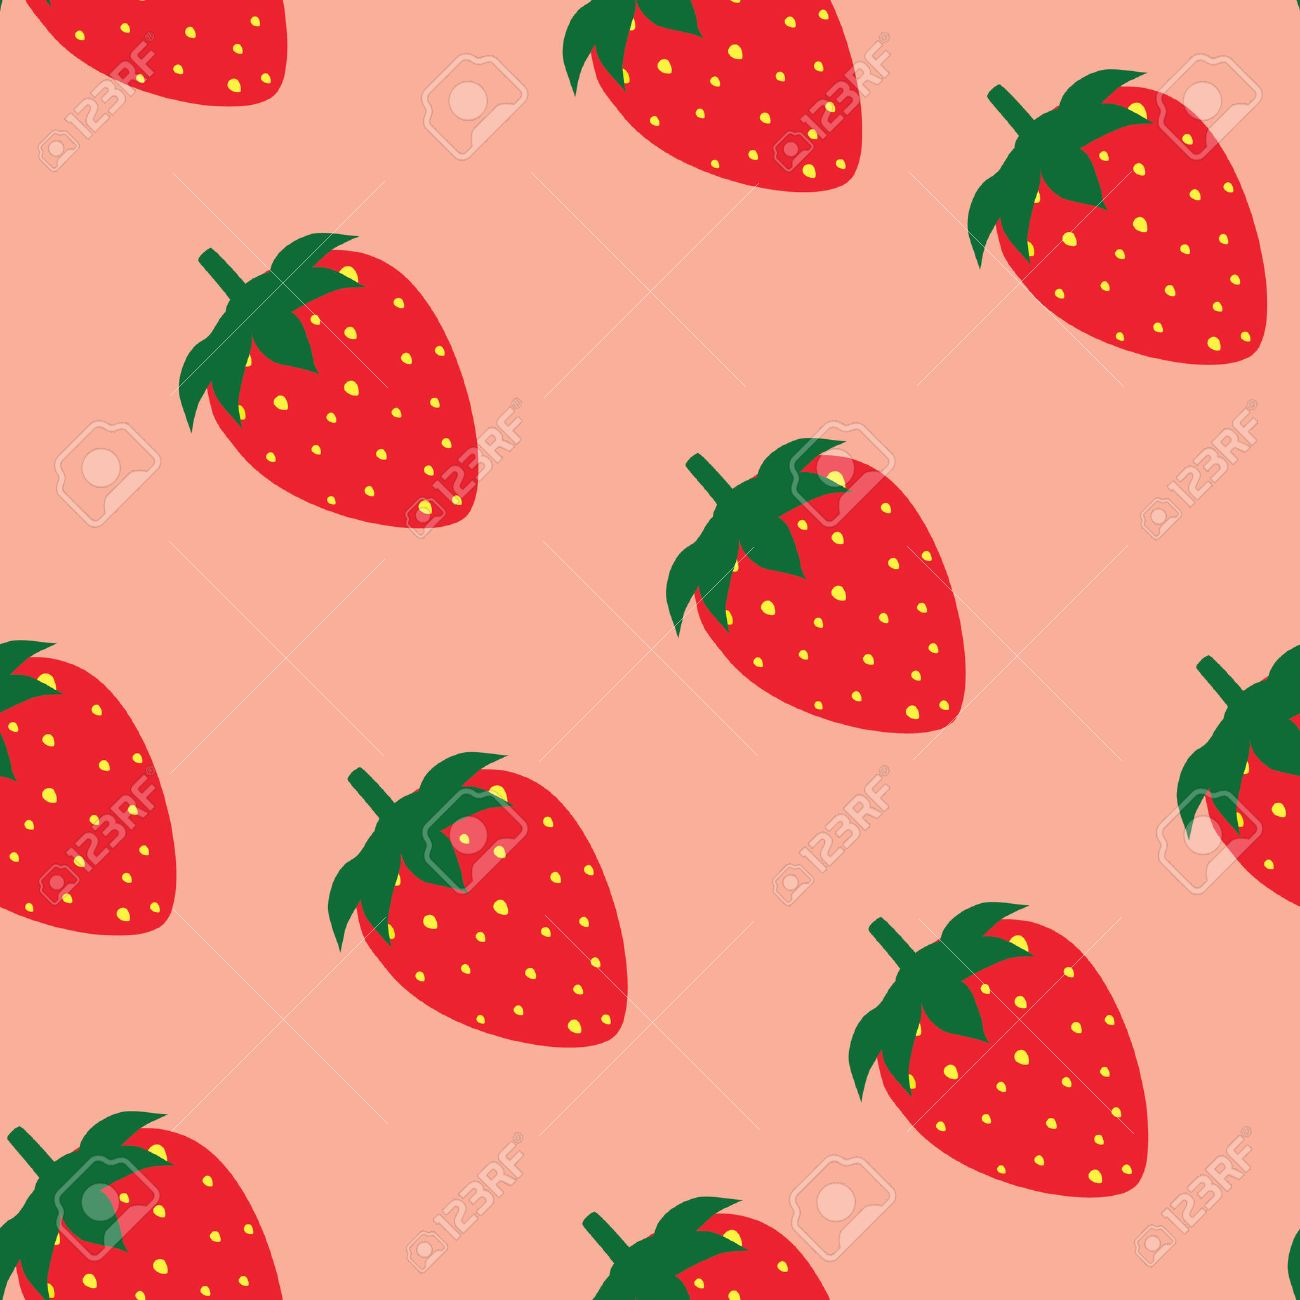 Strawberry pattern raster pink background, strawberry background - 46124351